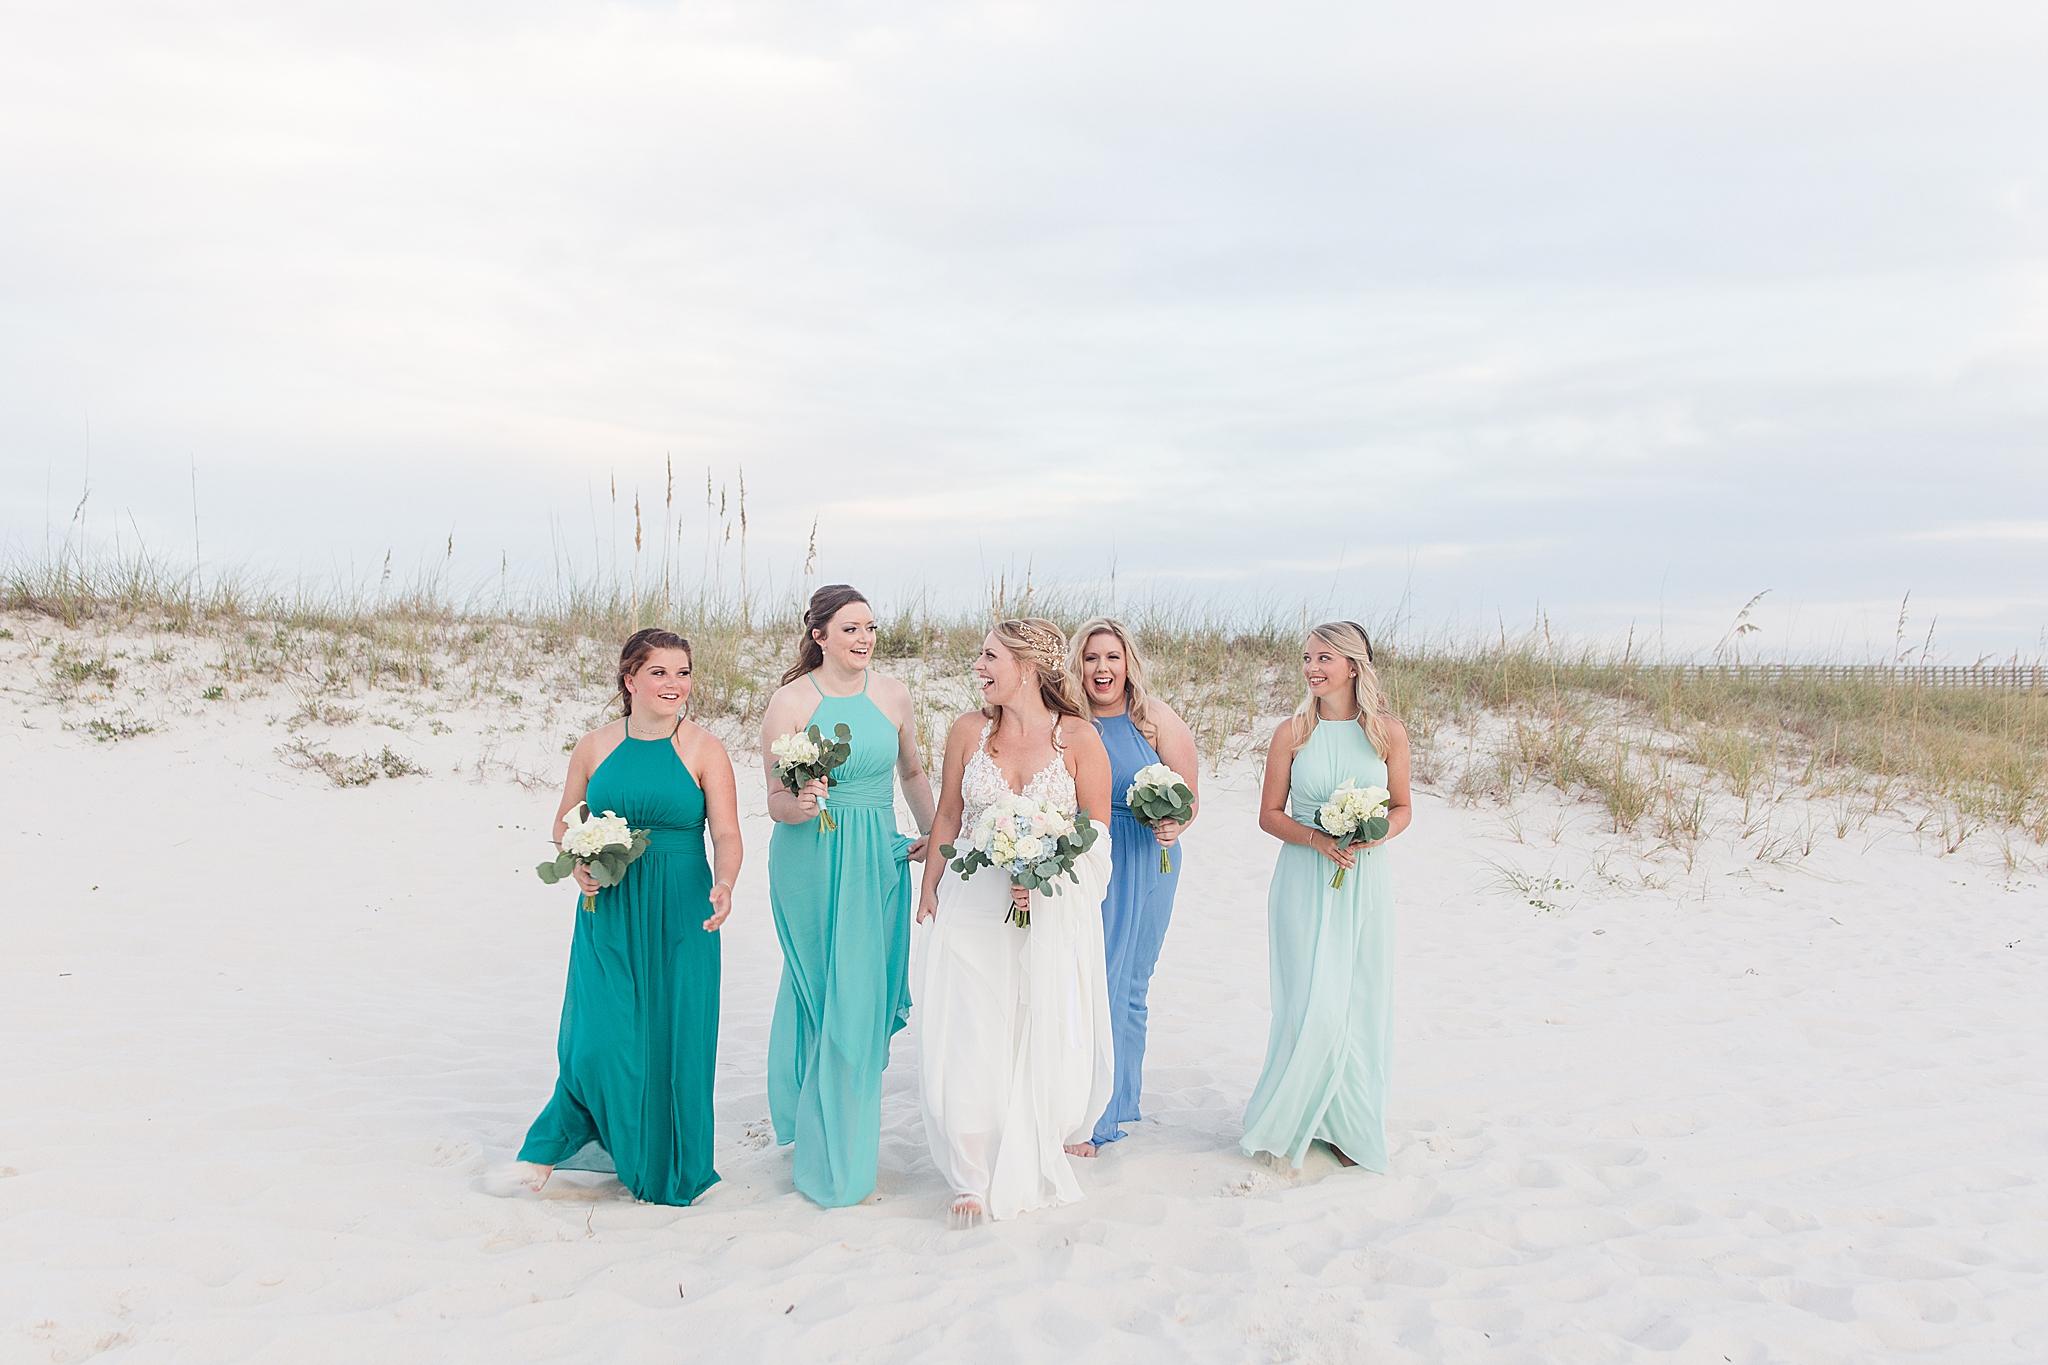 bridesmaids walk with bride along sand dunes